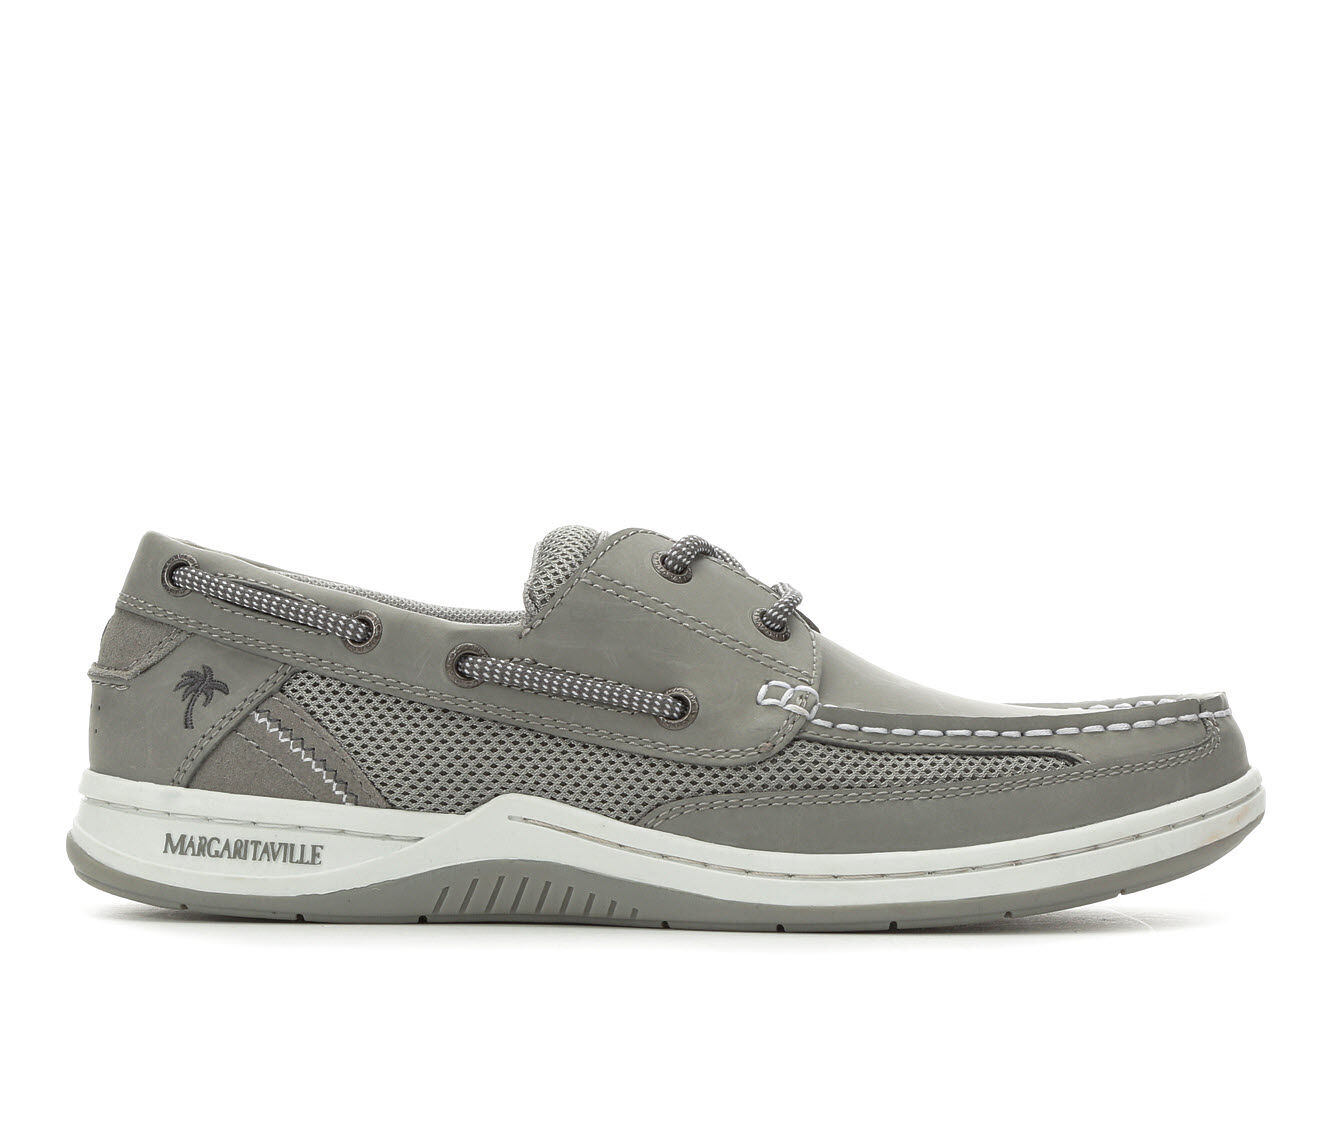 uk shoes_kd2392